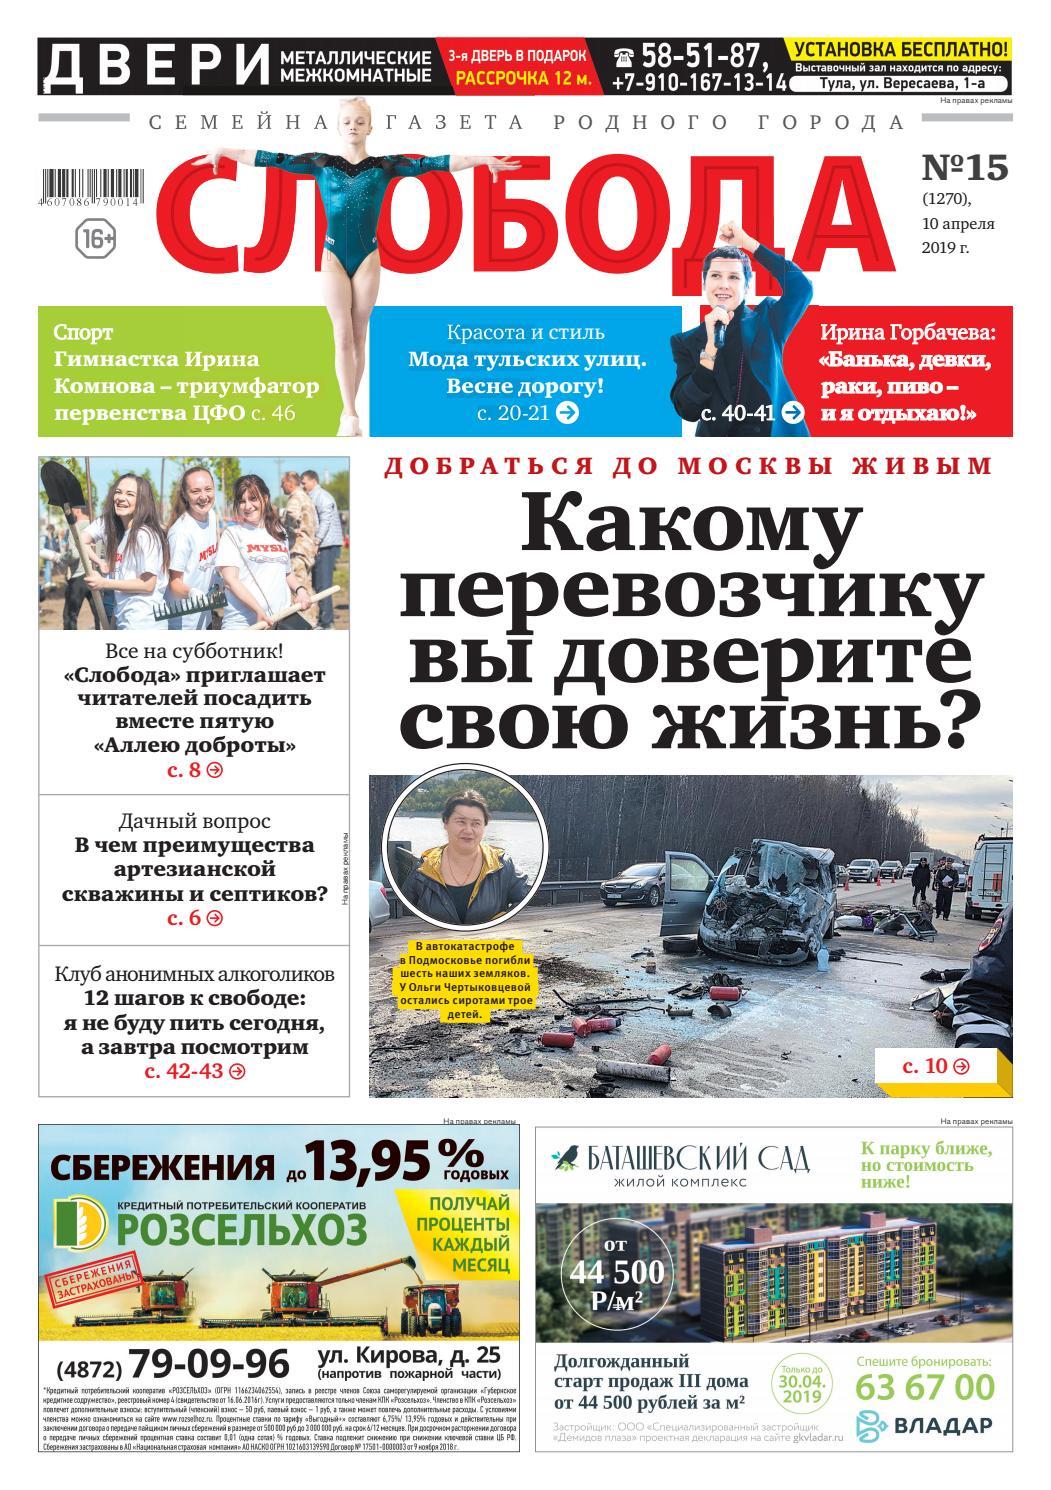 f5275f75d Слобода №15 (1270): Какому перевозчику вы доверите свою жизнь? by Газета